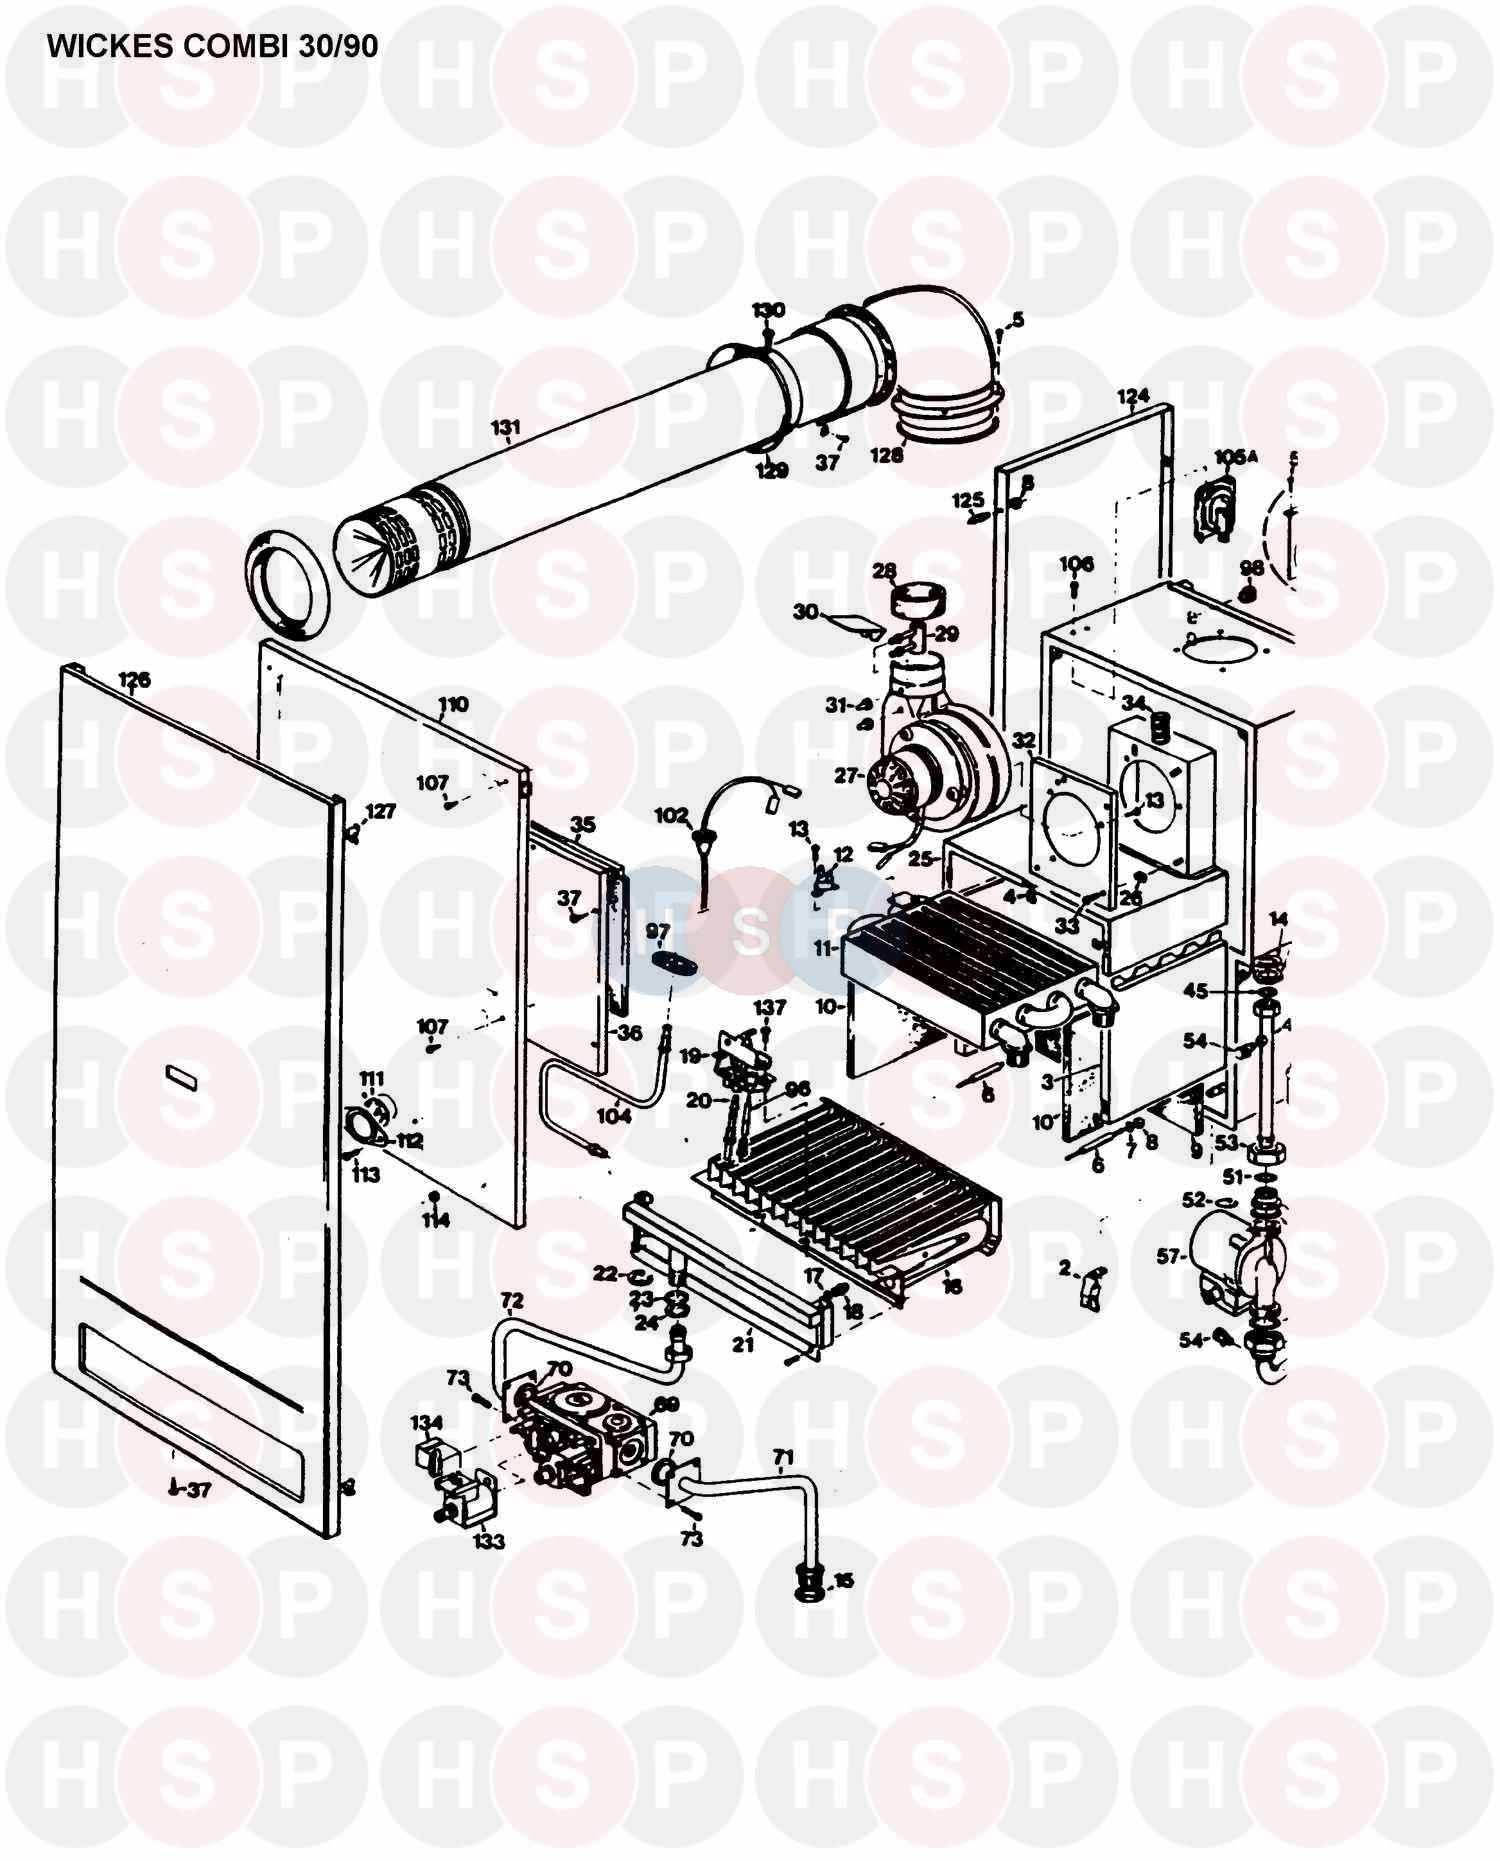 Fantastic Boiler Plumbing Diagram Embellishment - Everything You ...